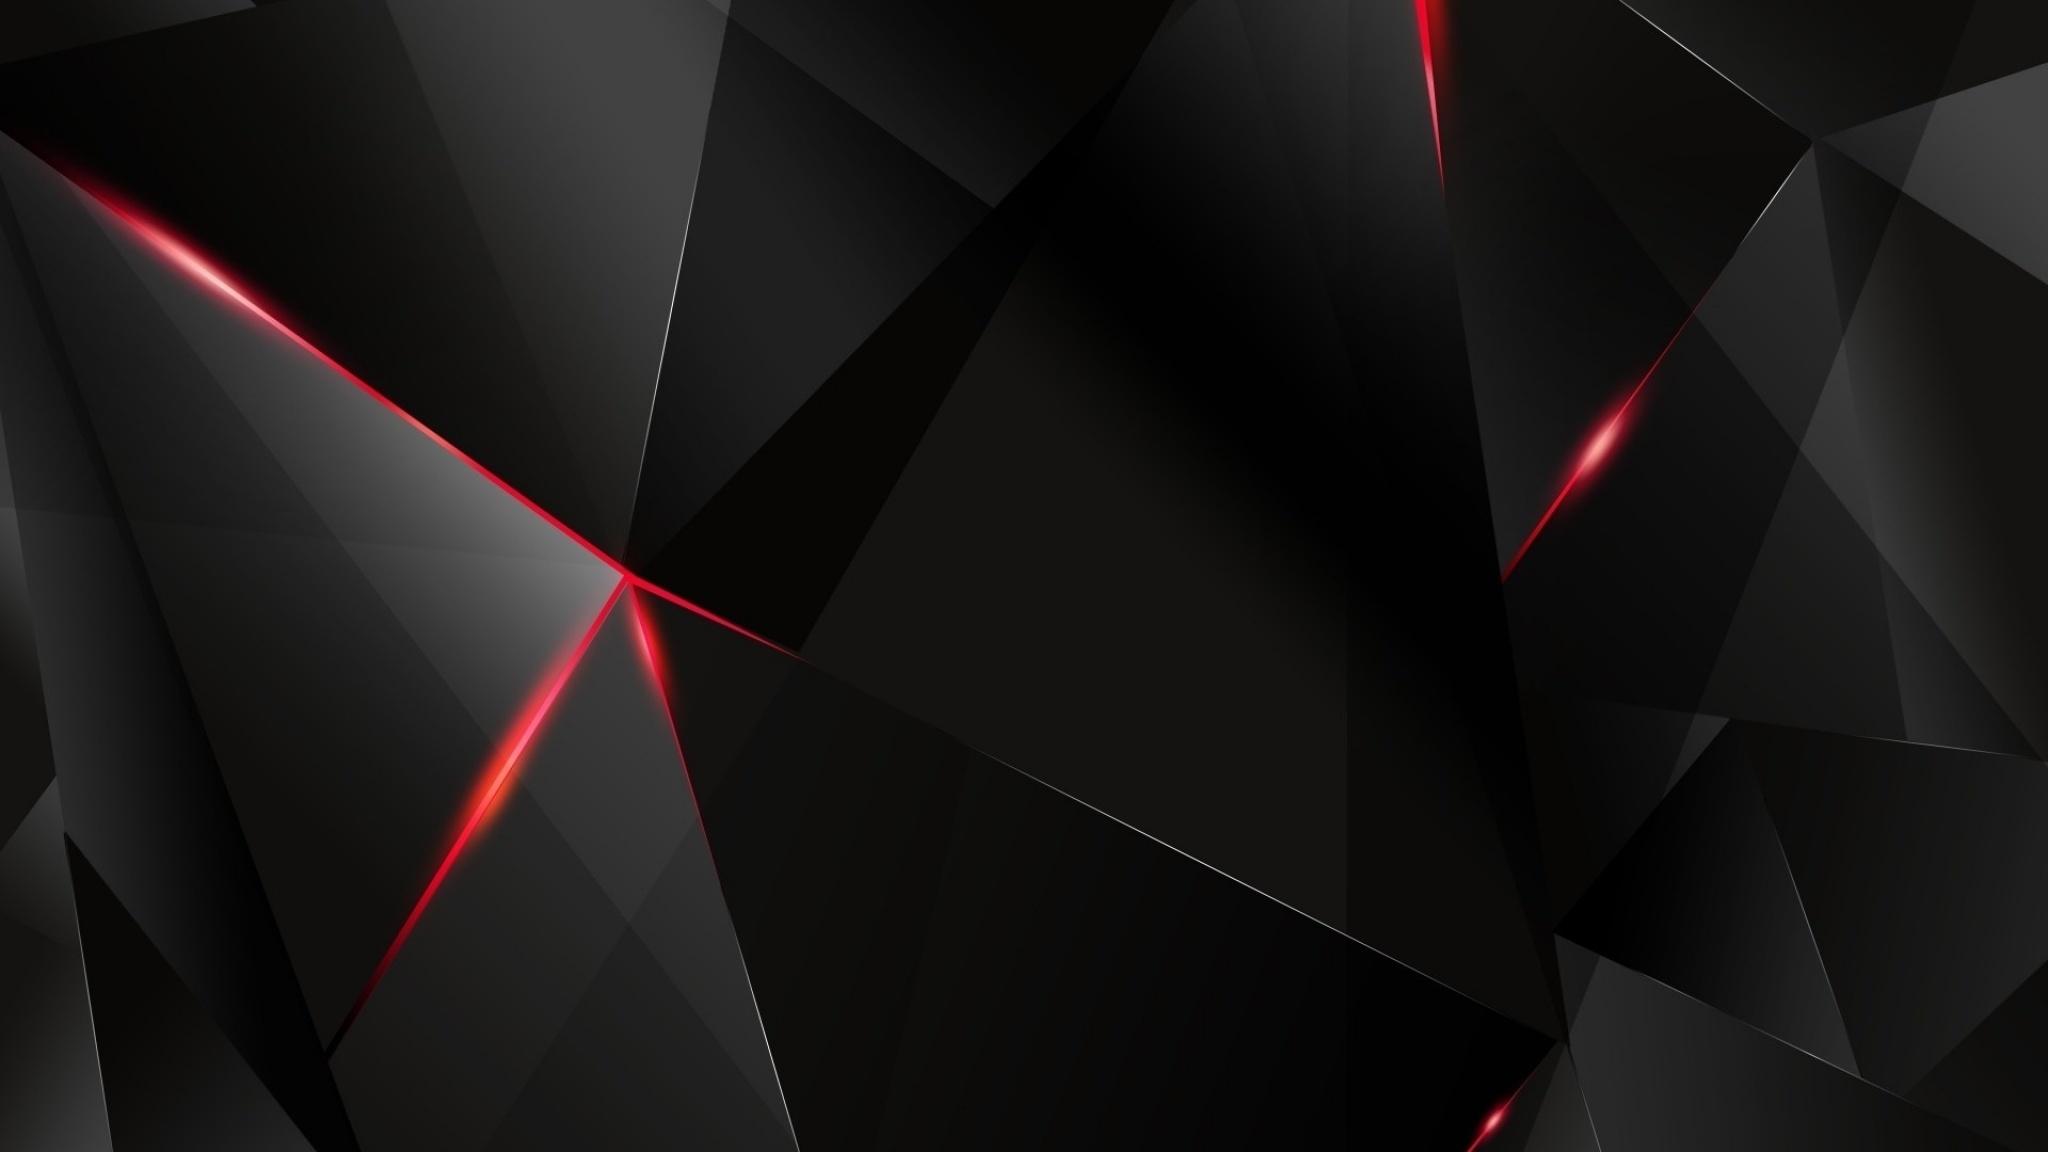 2048x1152 computer background